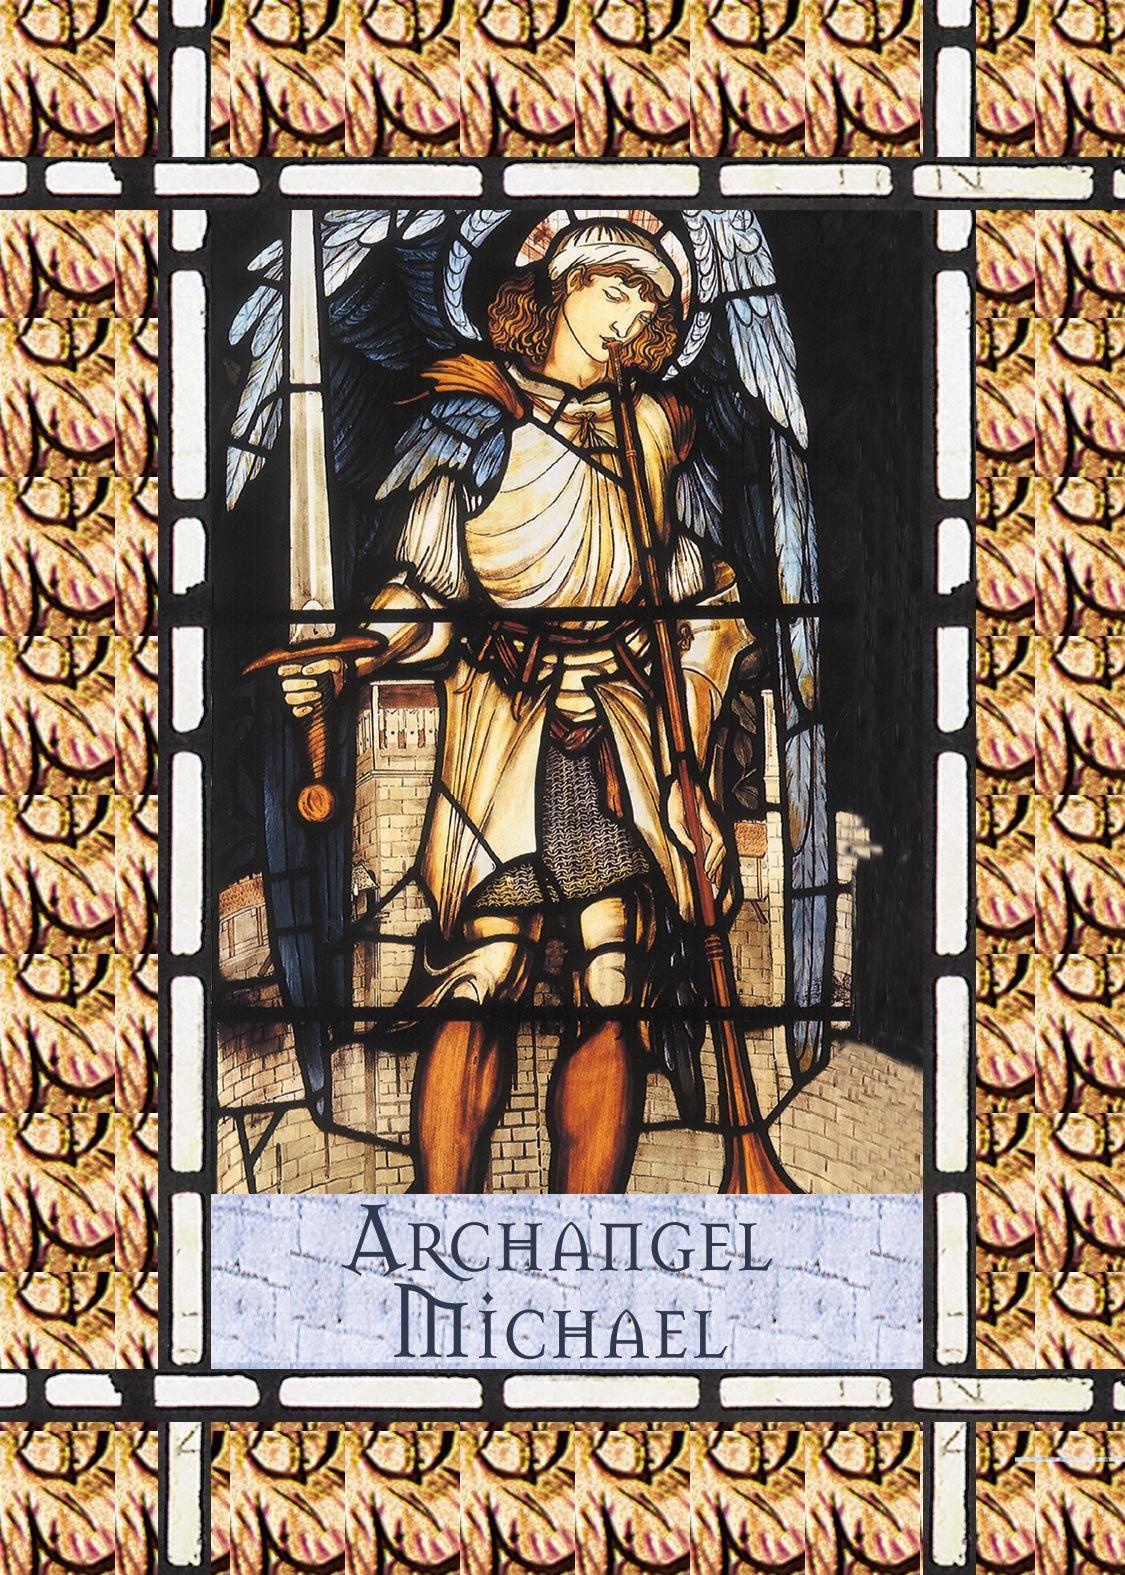 Oracle card archangel michael archangel michael